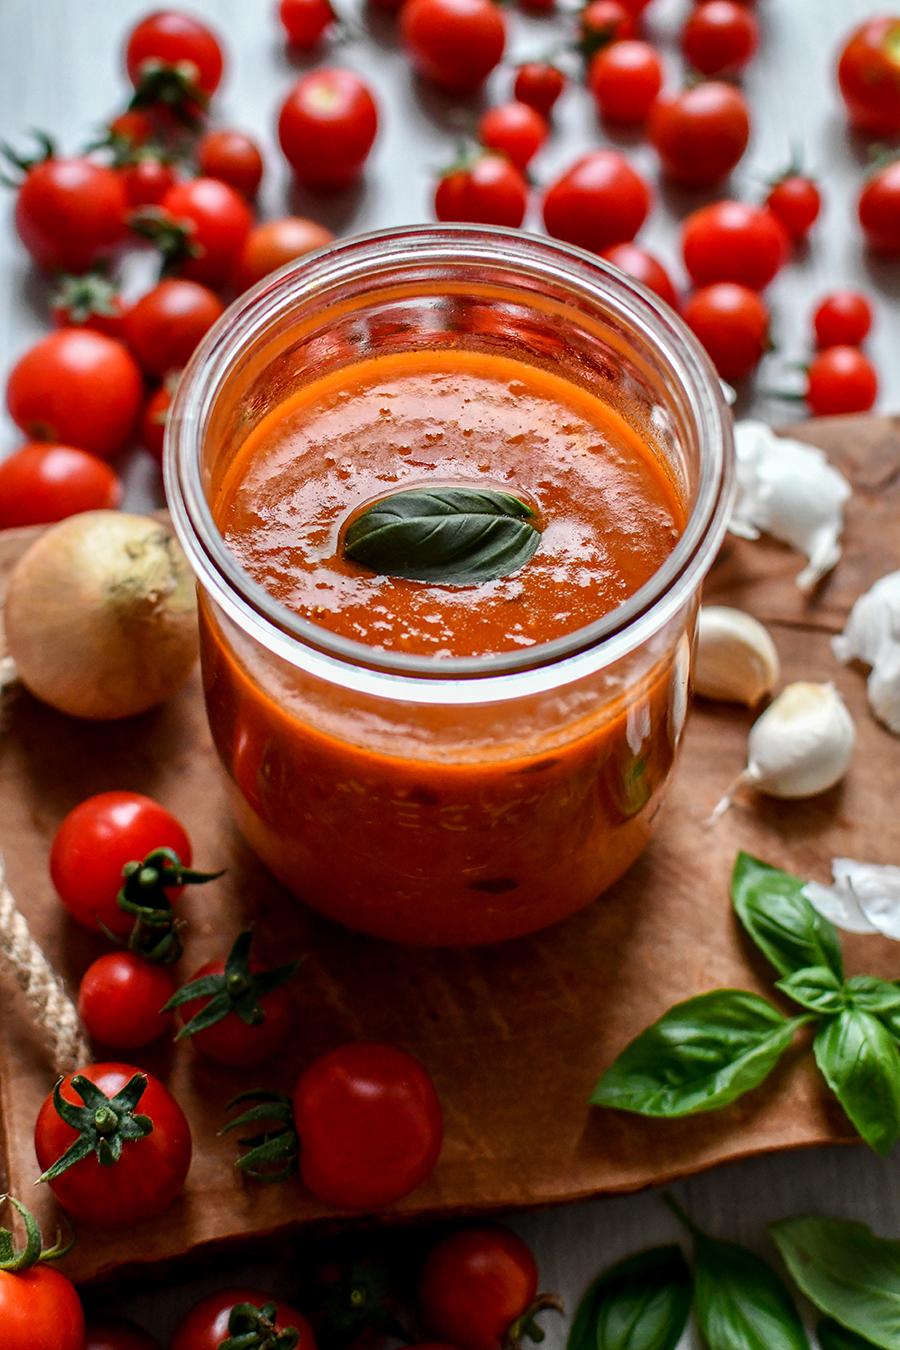 Grundrezept: Tomatensoße aus frischen Tomaten